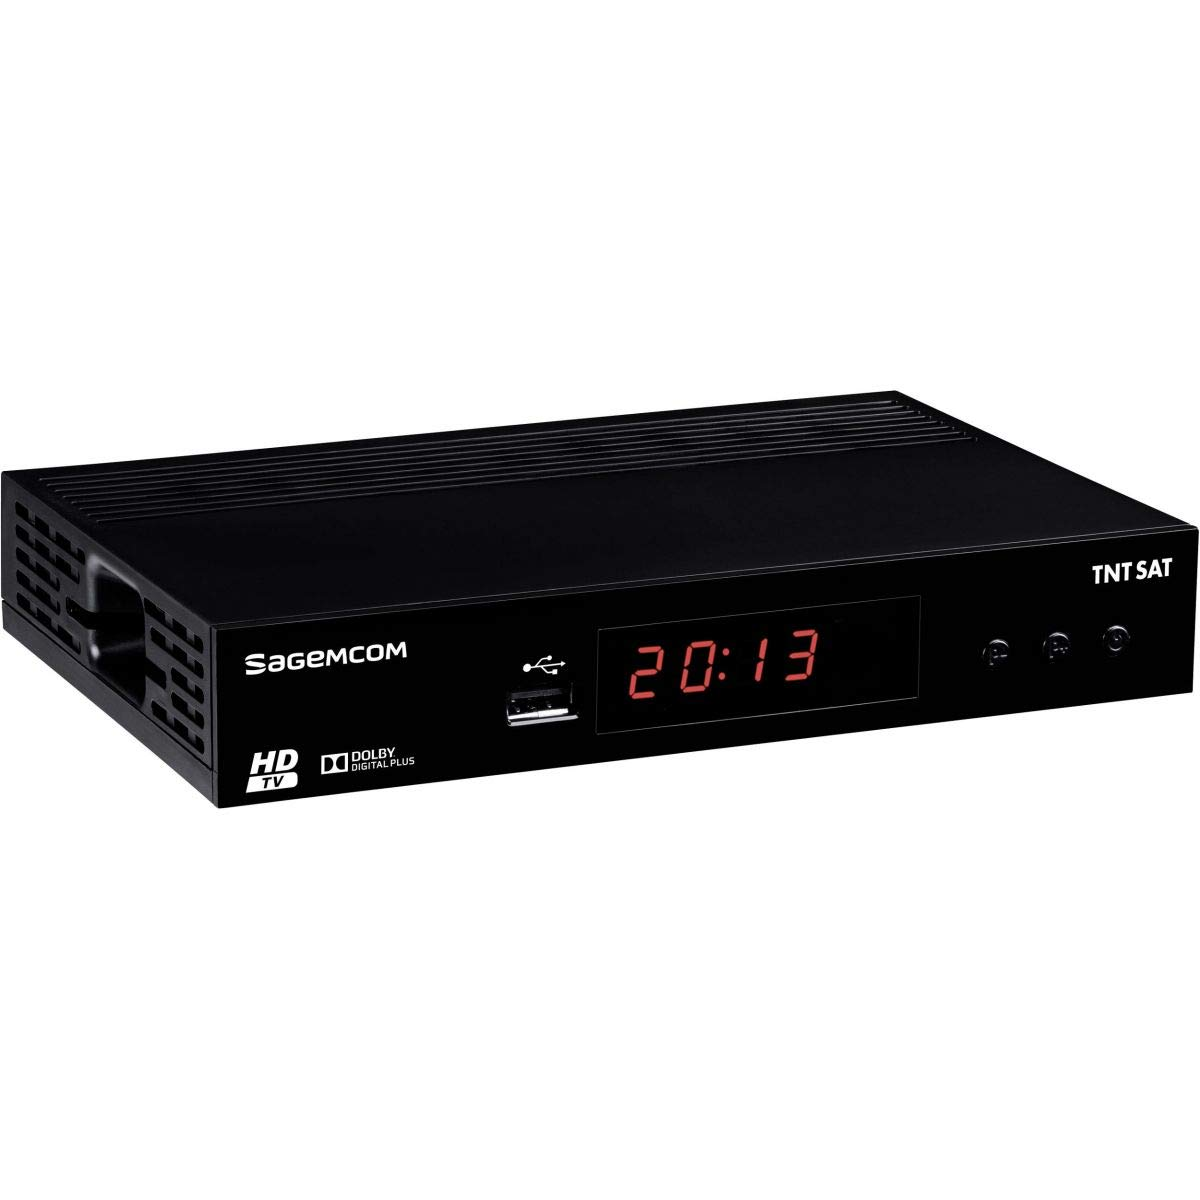 Sagemcom DS81 HD - Receptor Satellite Astra + Tarjeta TDT Sat V6 ...